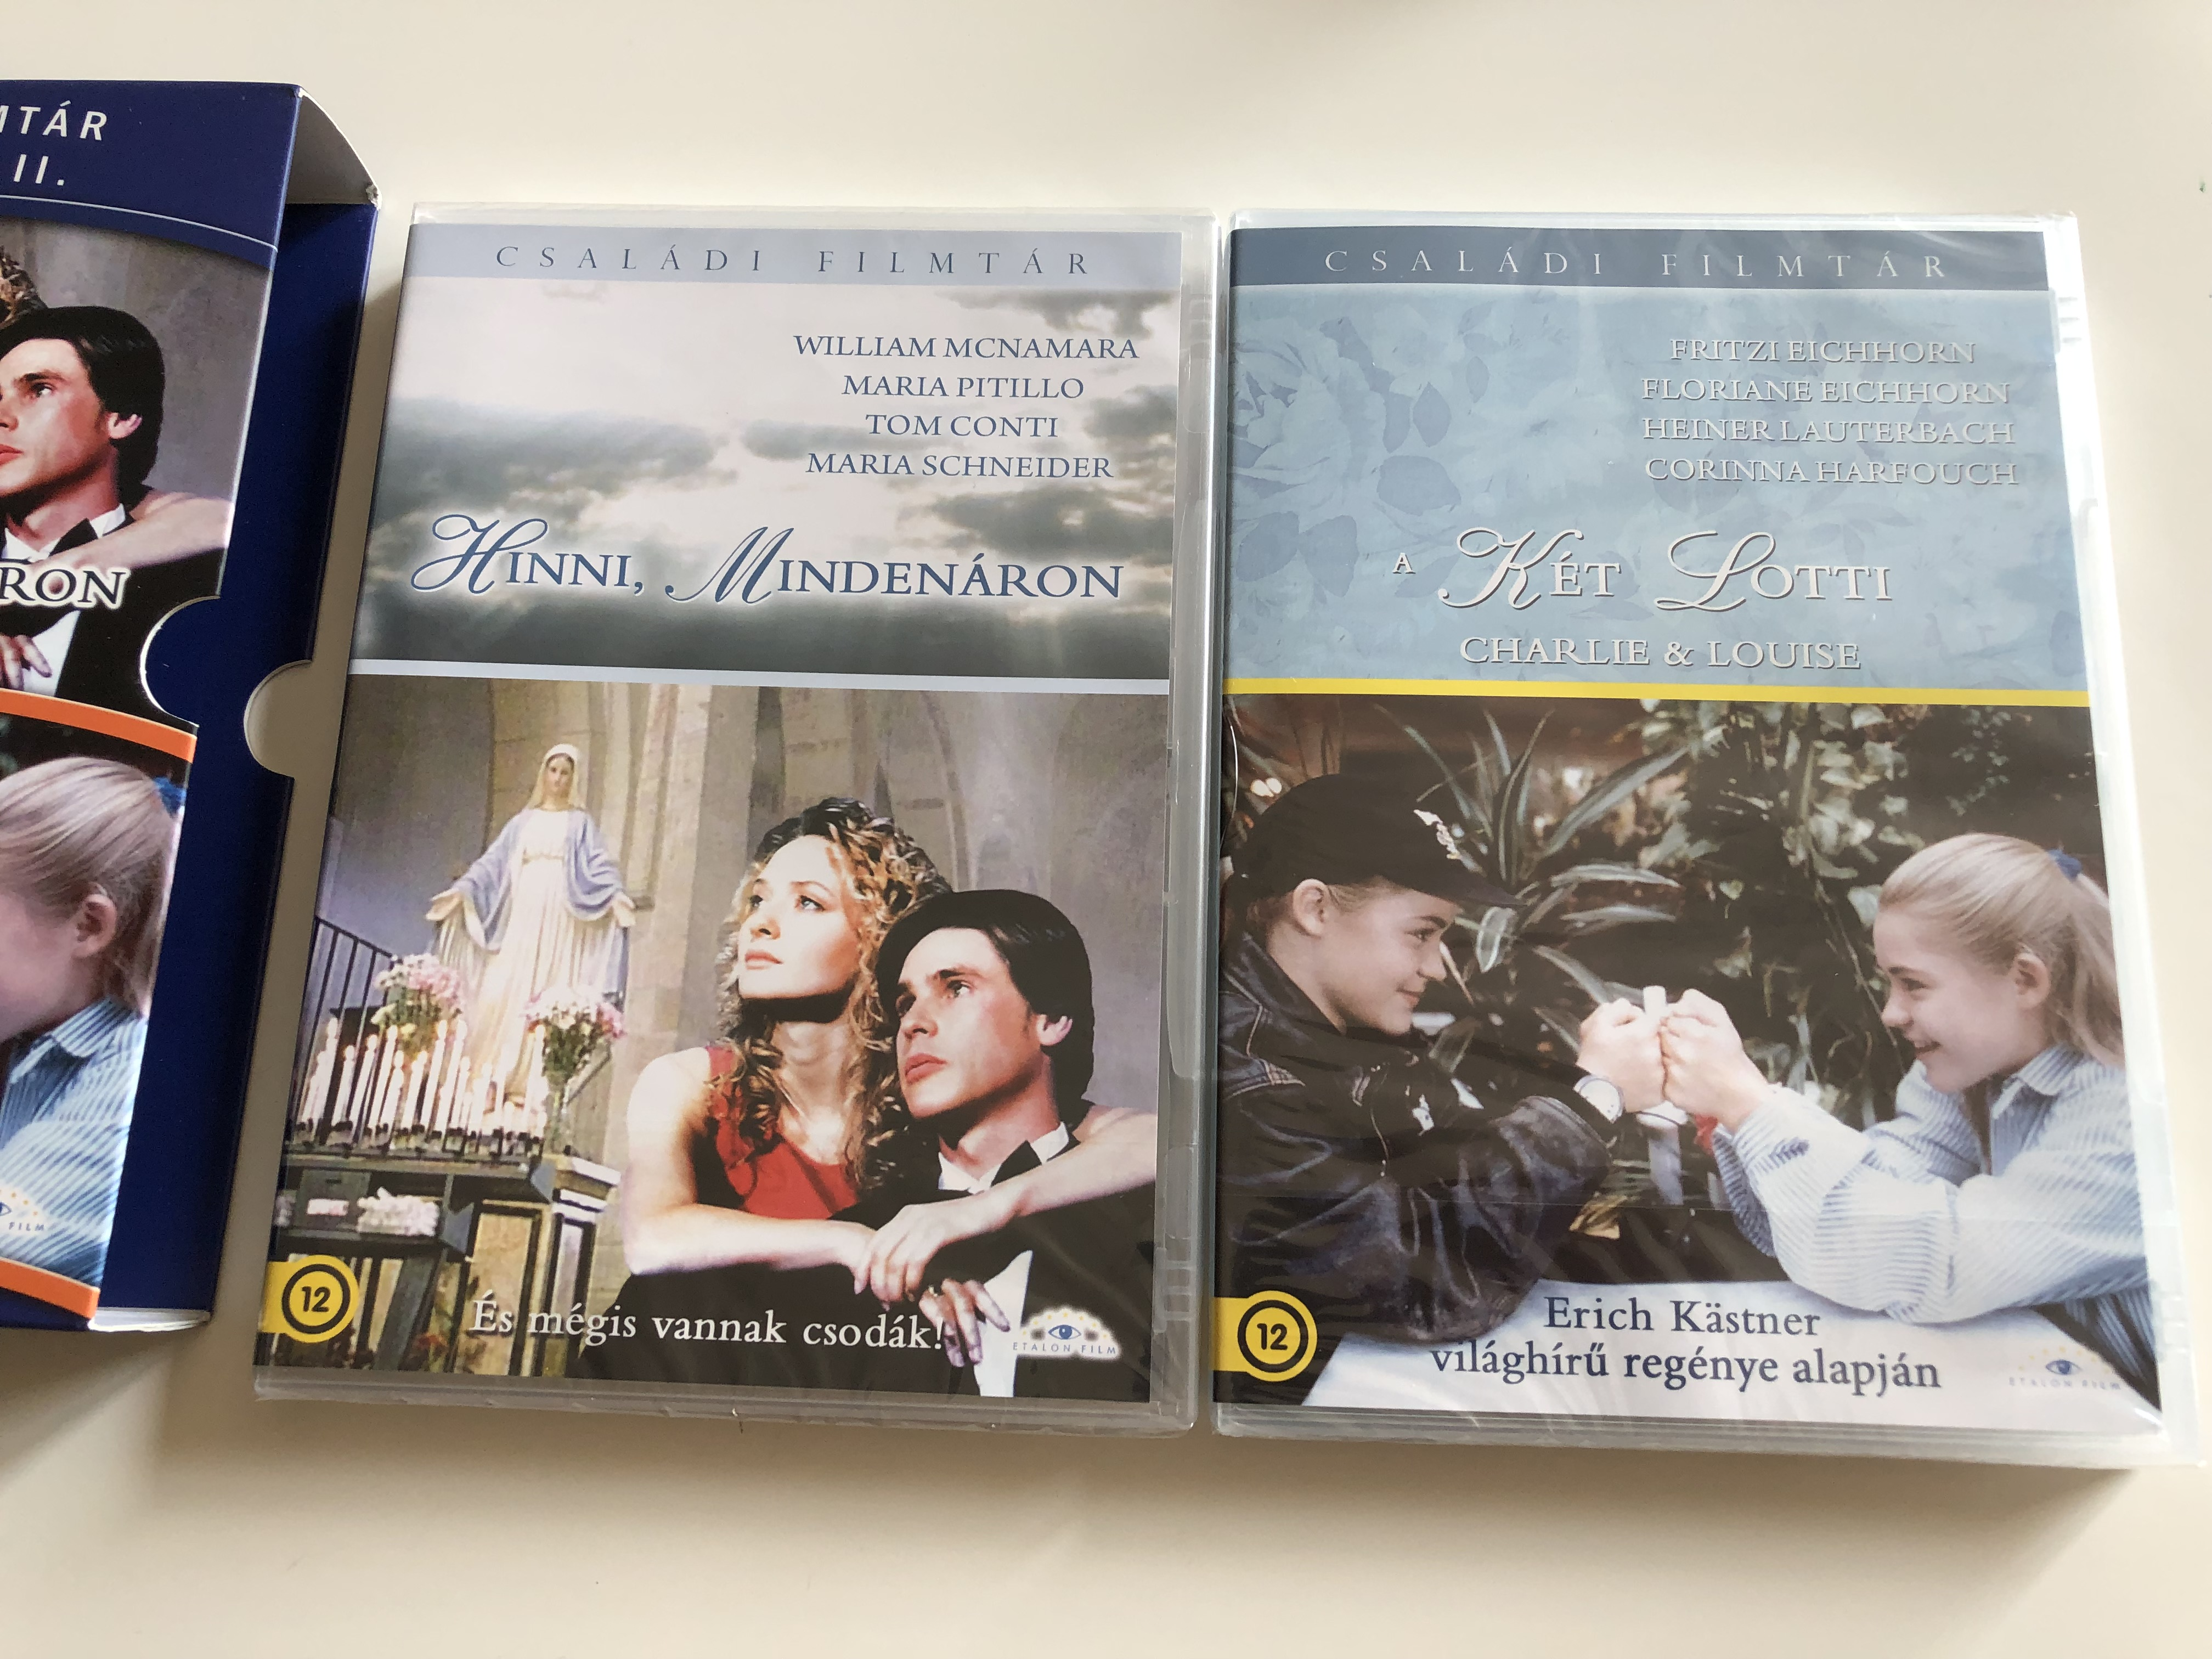 family-film-collection-ii-something-to-believe-in-1998-charlie-louise-1994-2-dvd-sleeve-l-lekemel-csal-di-filmek-csal-di-filmt-r-gy-jtem-ny-ii-5-.jpg